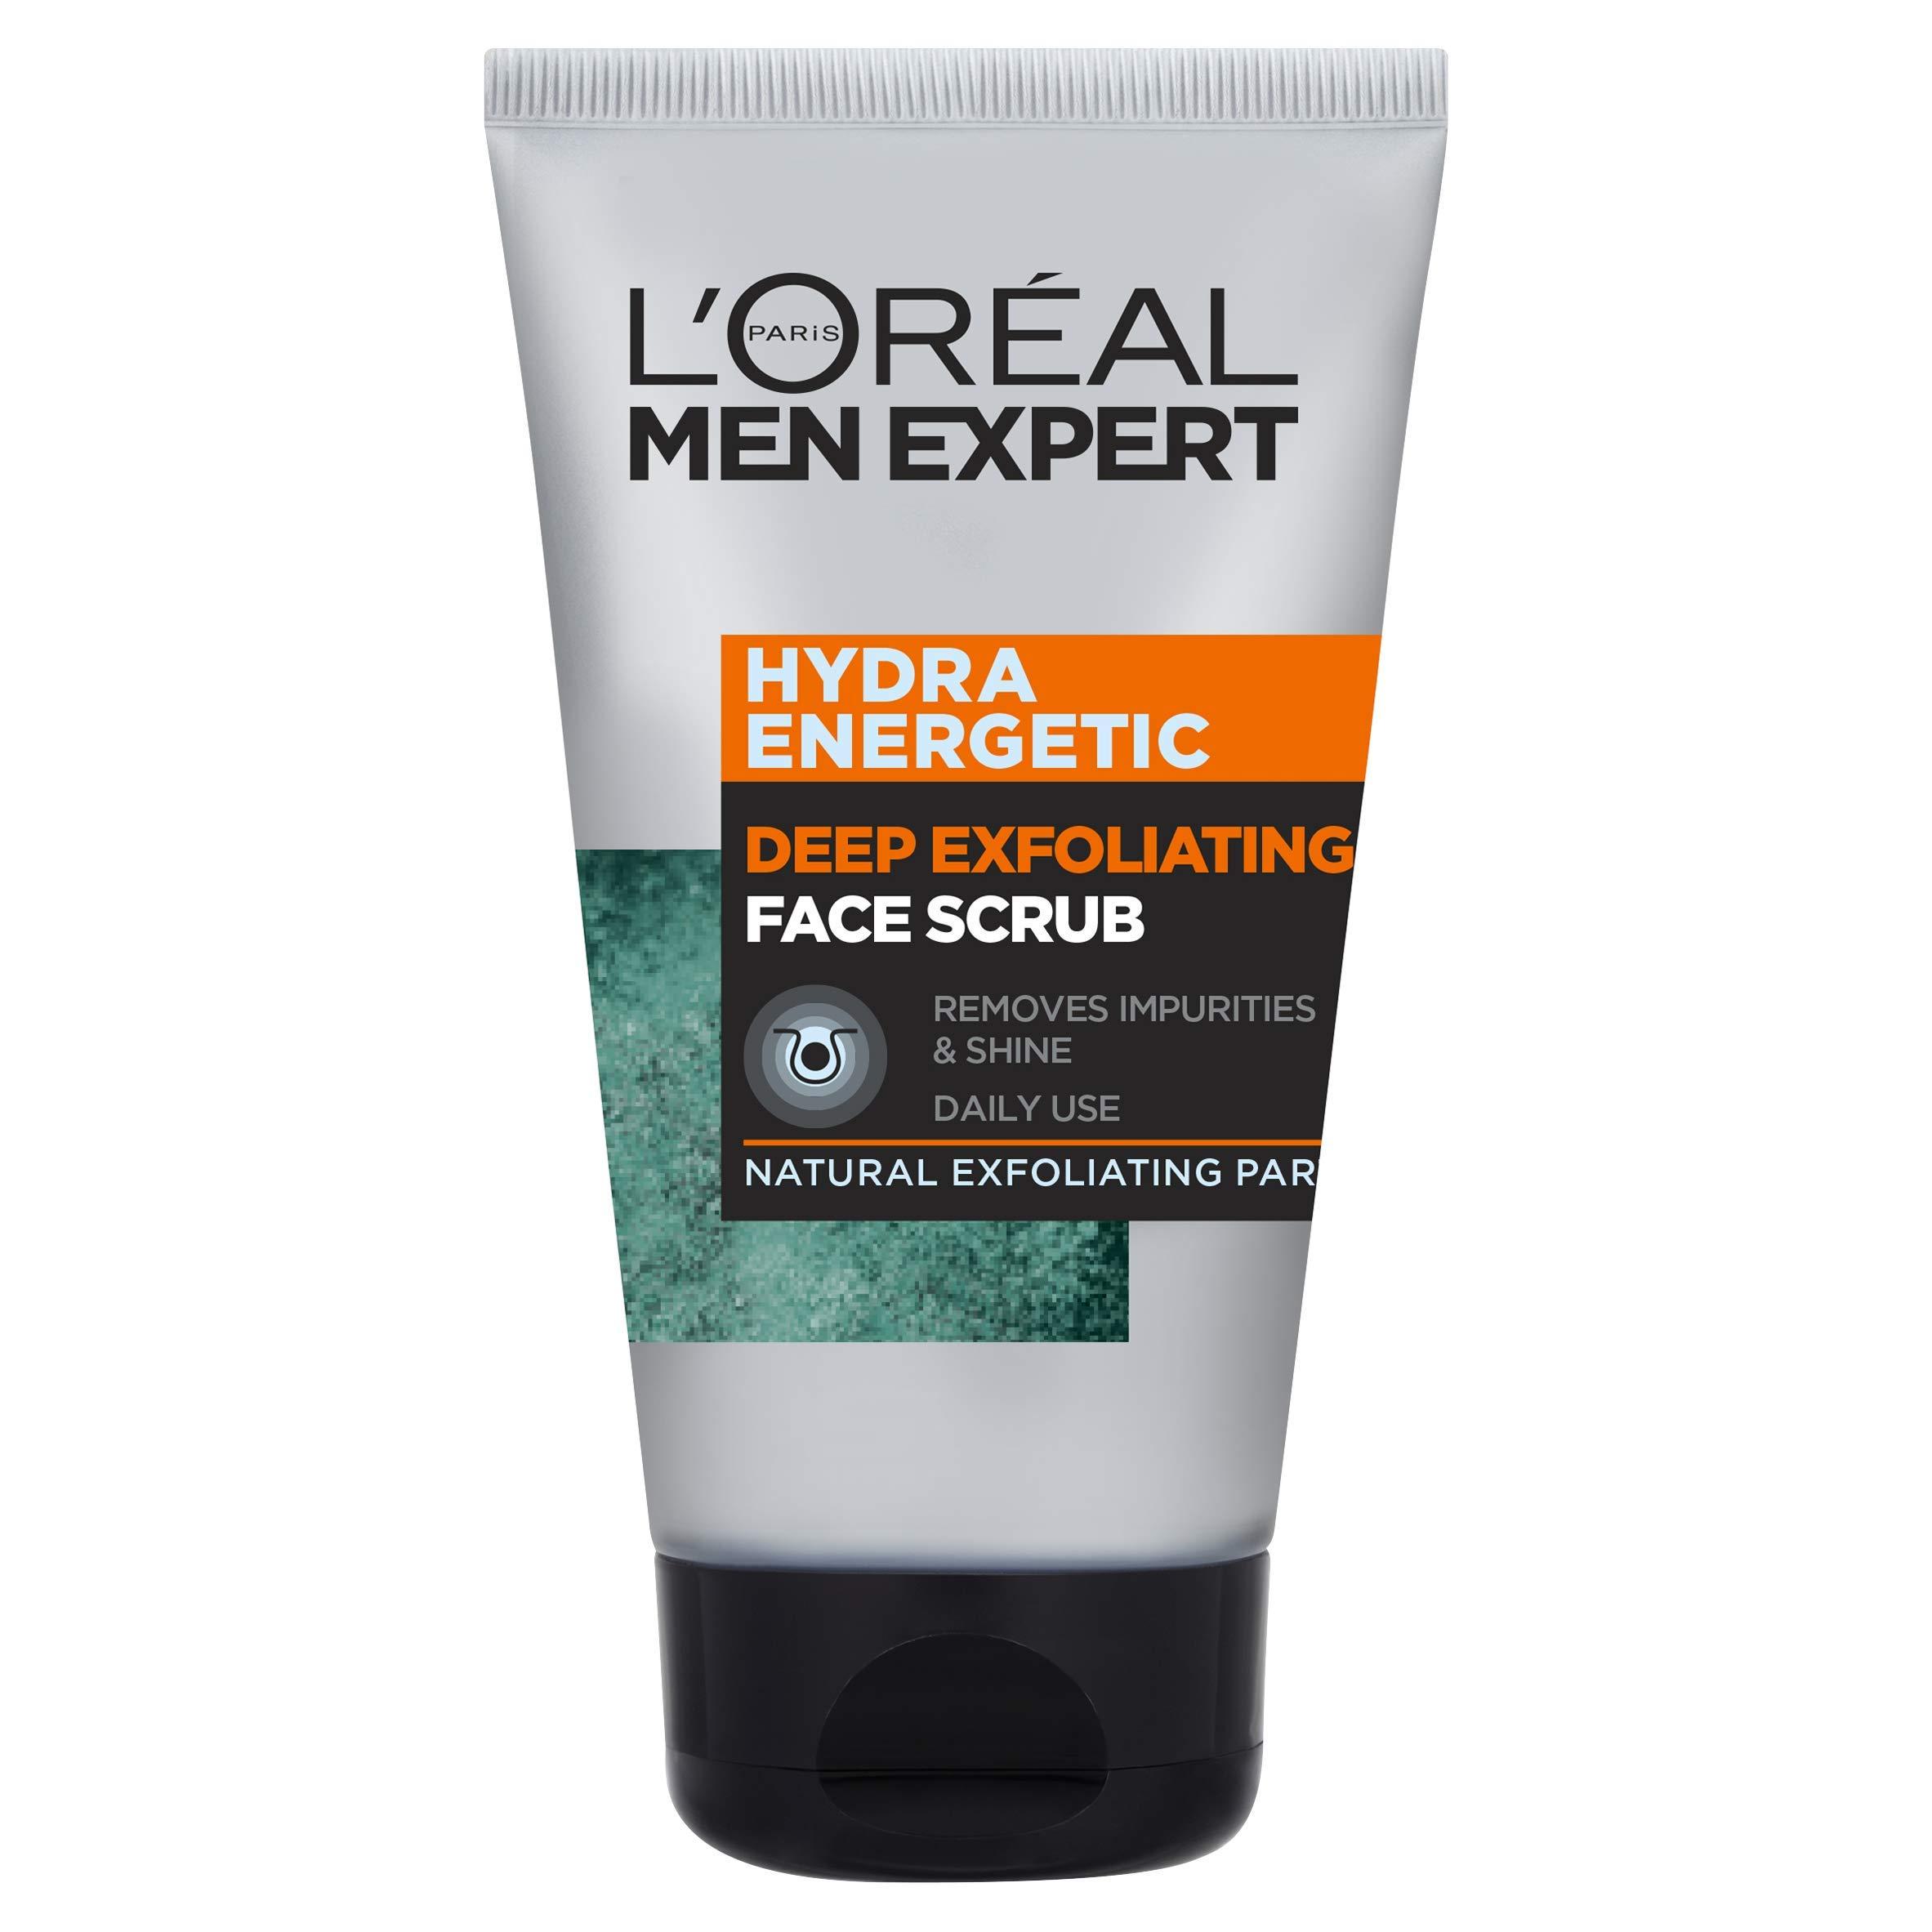 L'Oréal Men Expert Face Scrub, Hydra Energetic Deep Exfoliating Face Wash for Men 100 ml